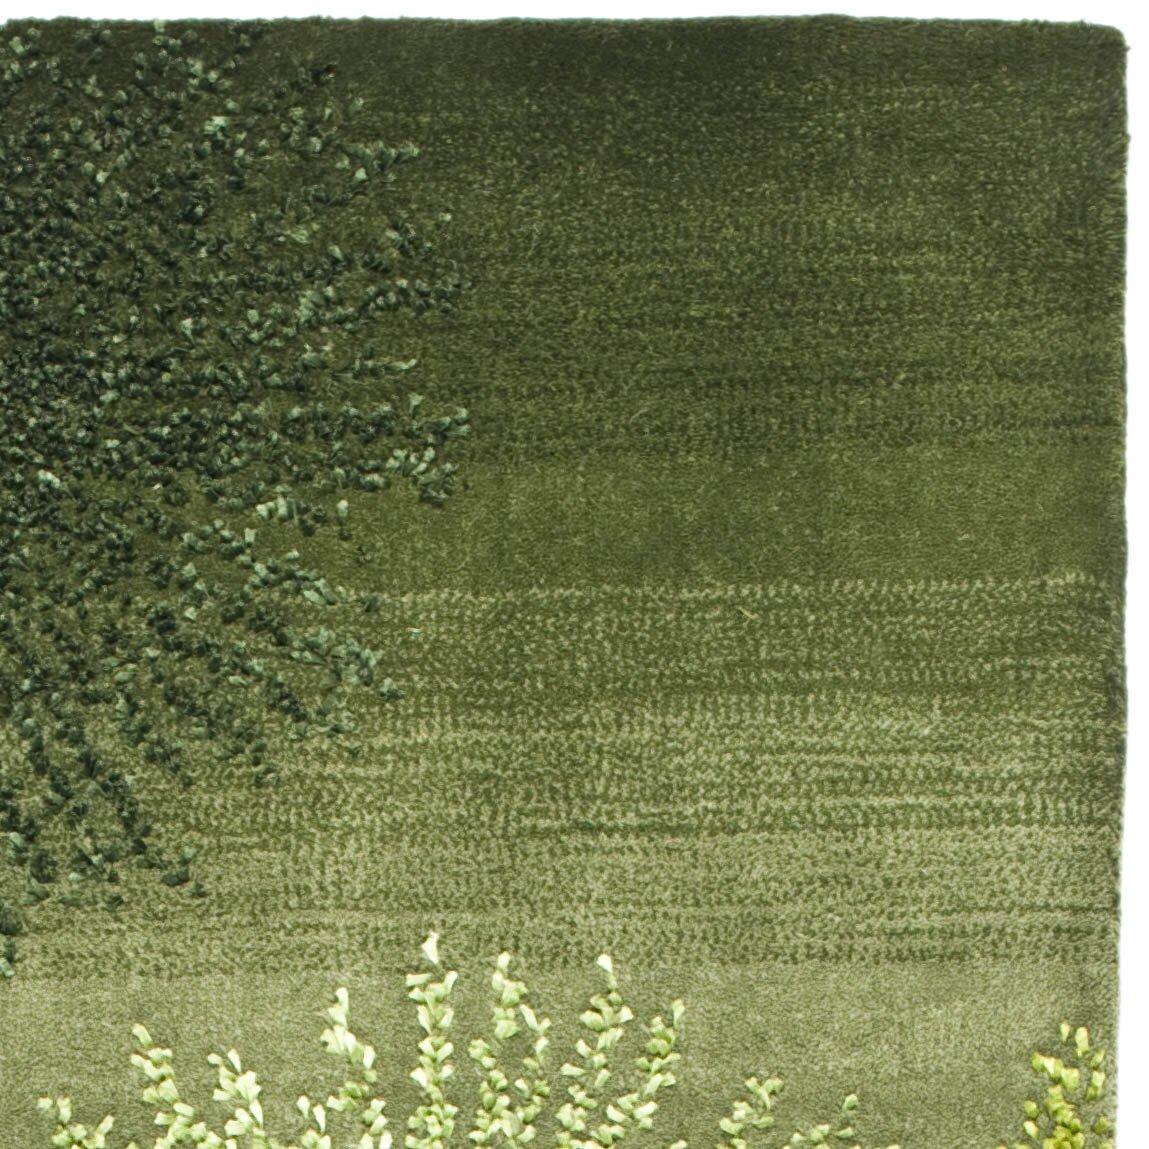 Safavieh Soho Green Area Rug & Reviews